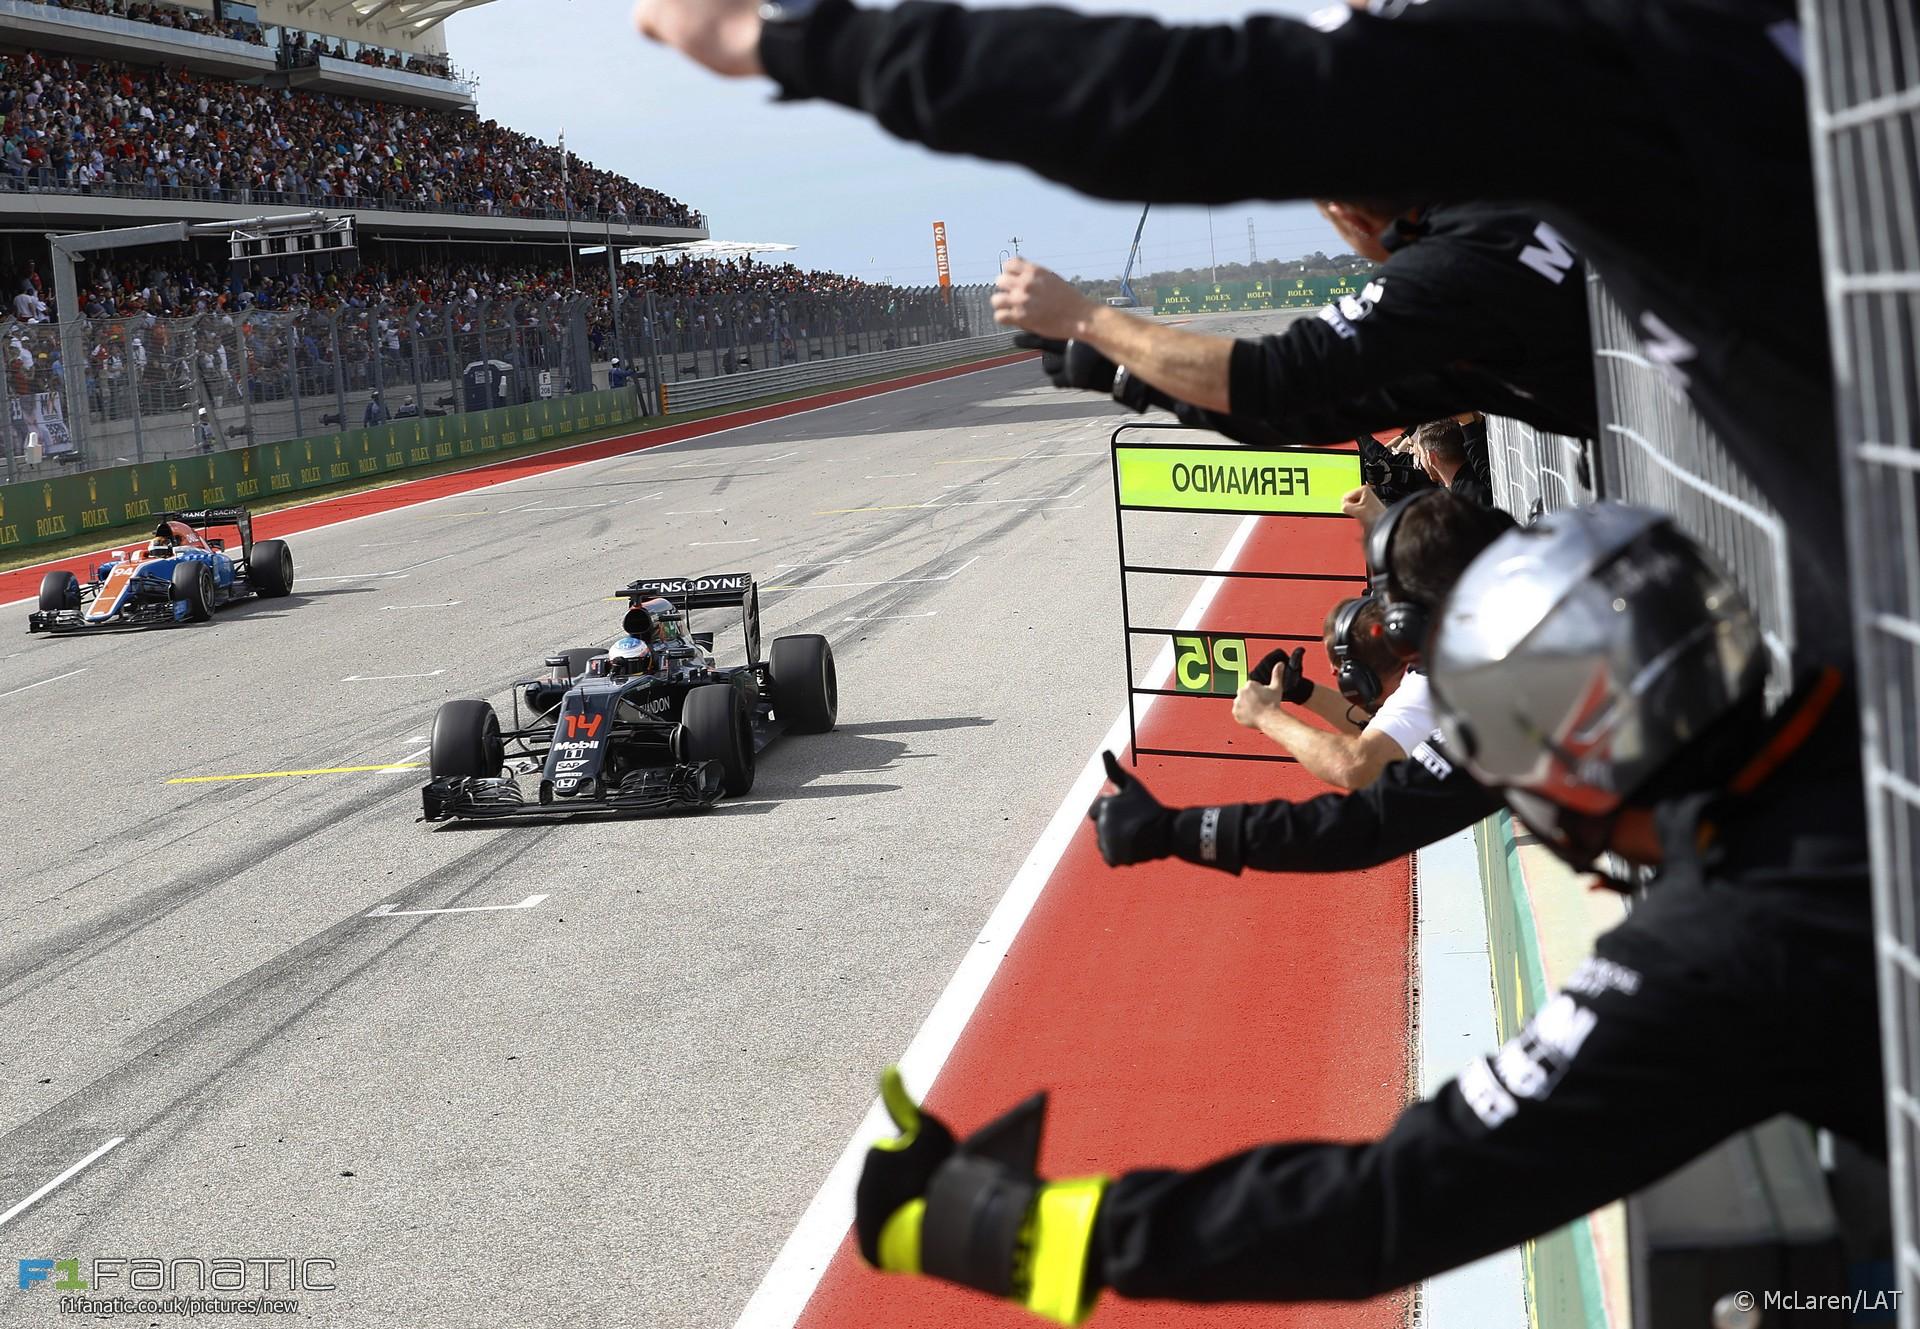 Fernando Alonso, McLaren, Circuit of the Americas, 2016